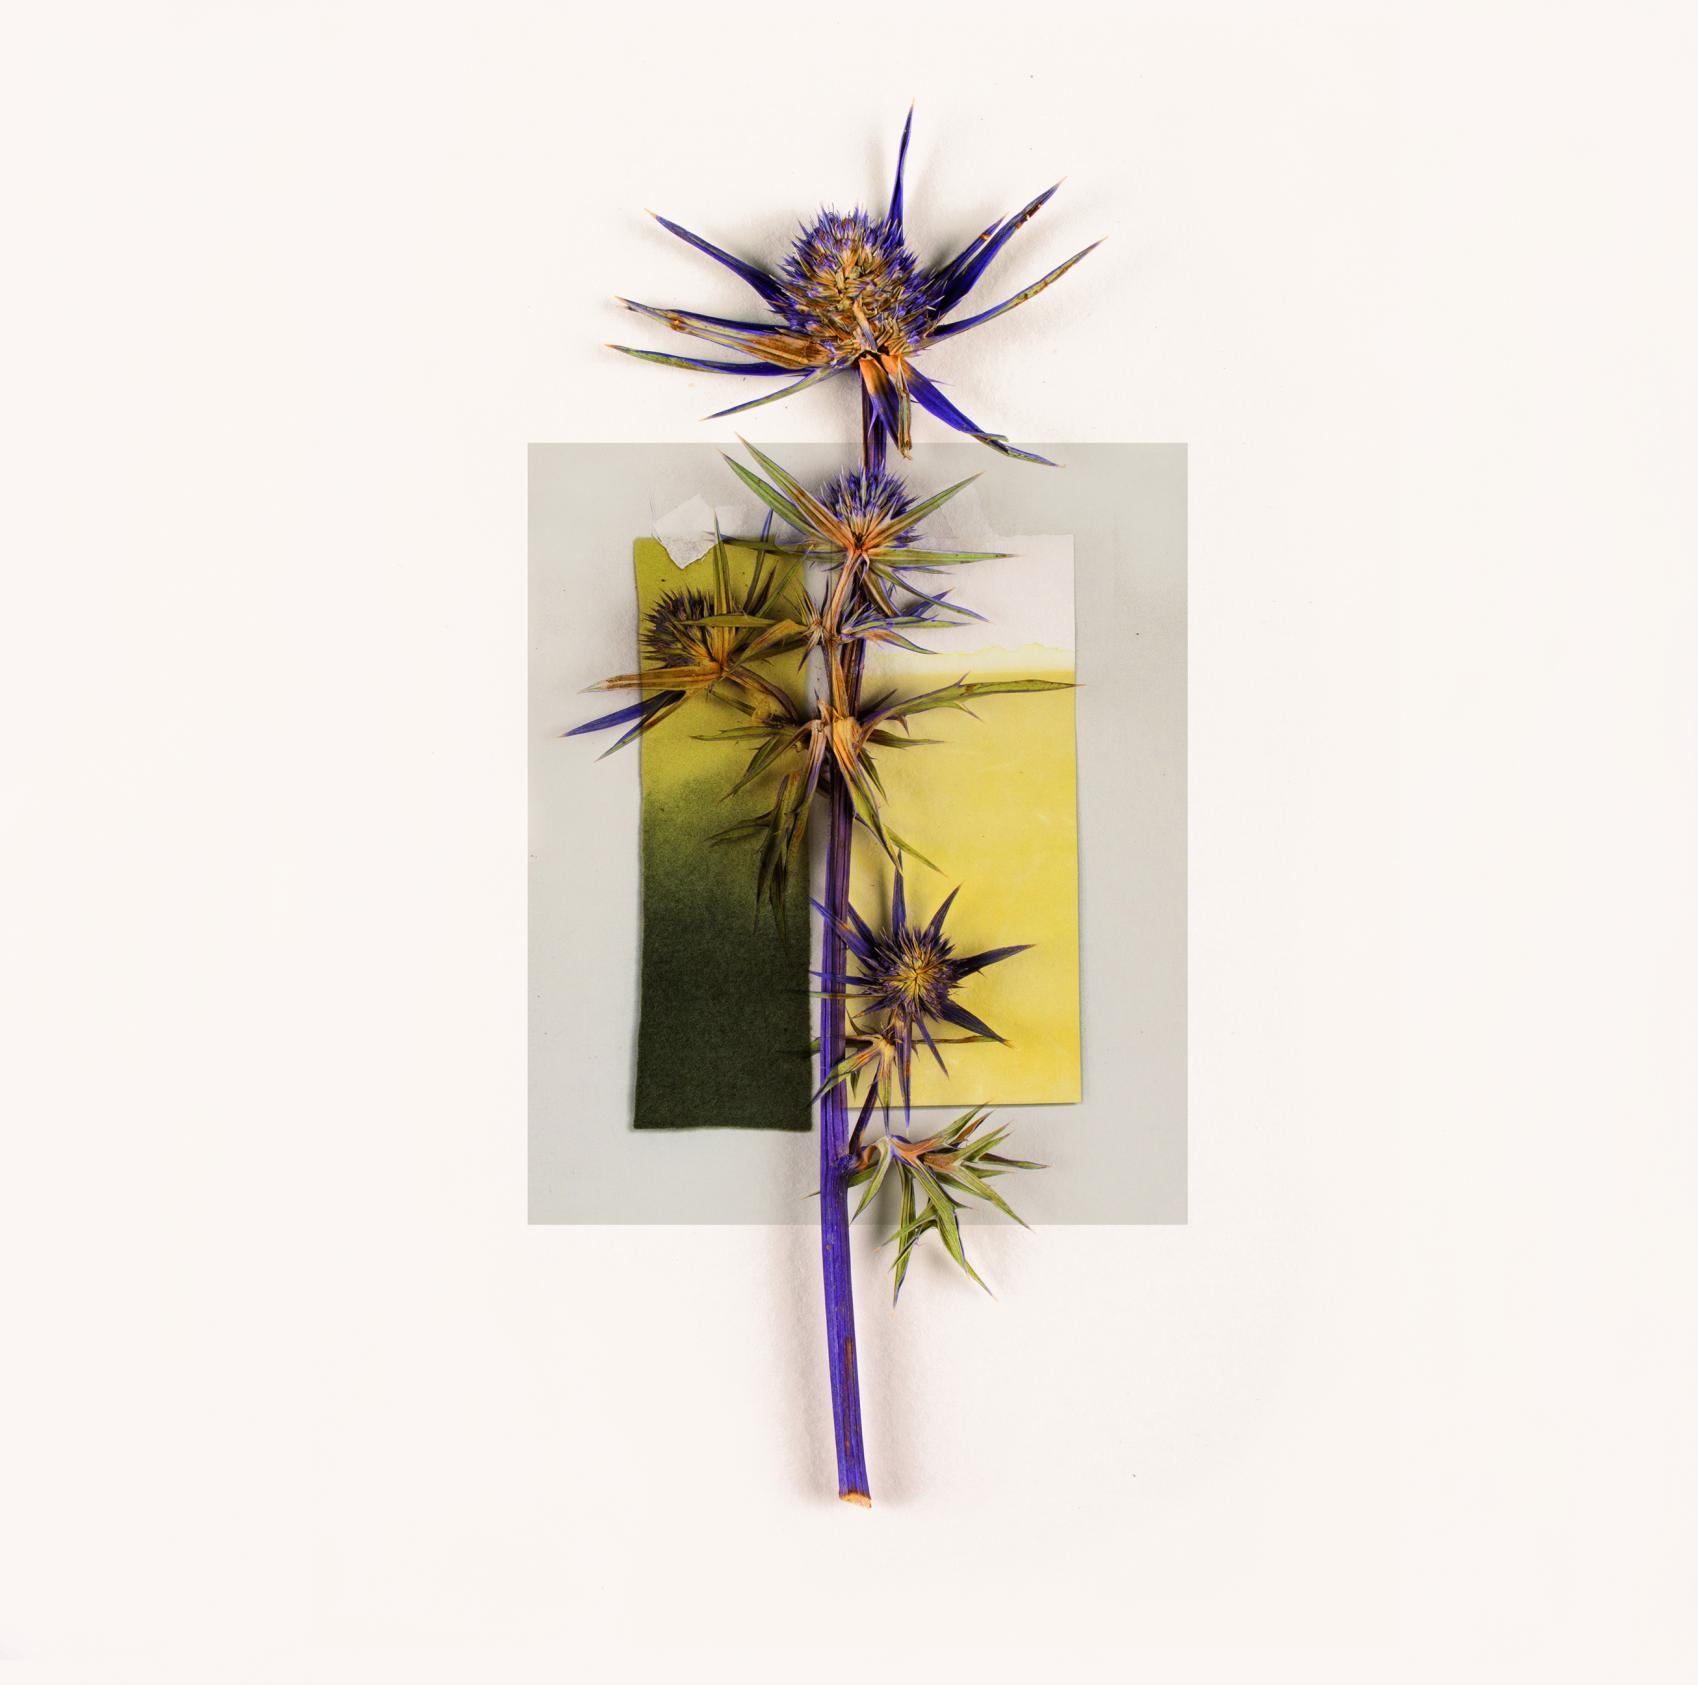 pantone-paisaje. eryngium (2018) - MCarmen G. Mahedero - Inula